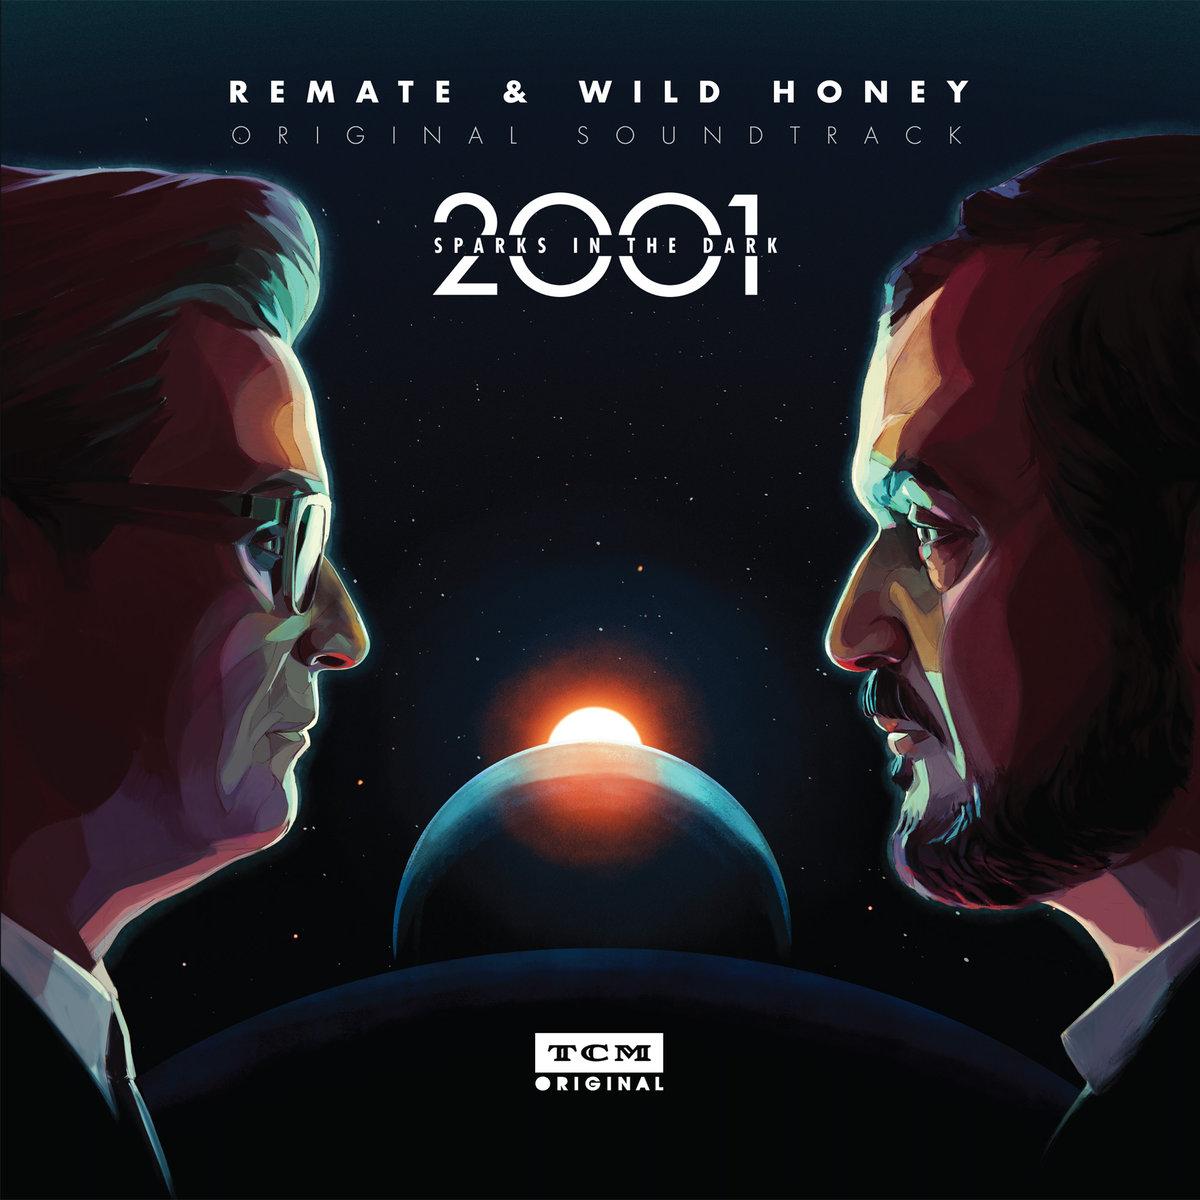 portada del album 2001 Sparks in the Dark Original Soundtrack